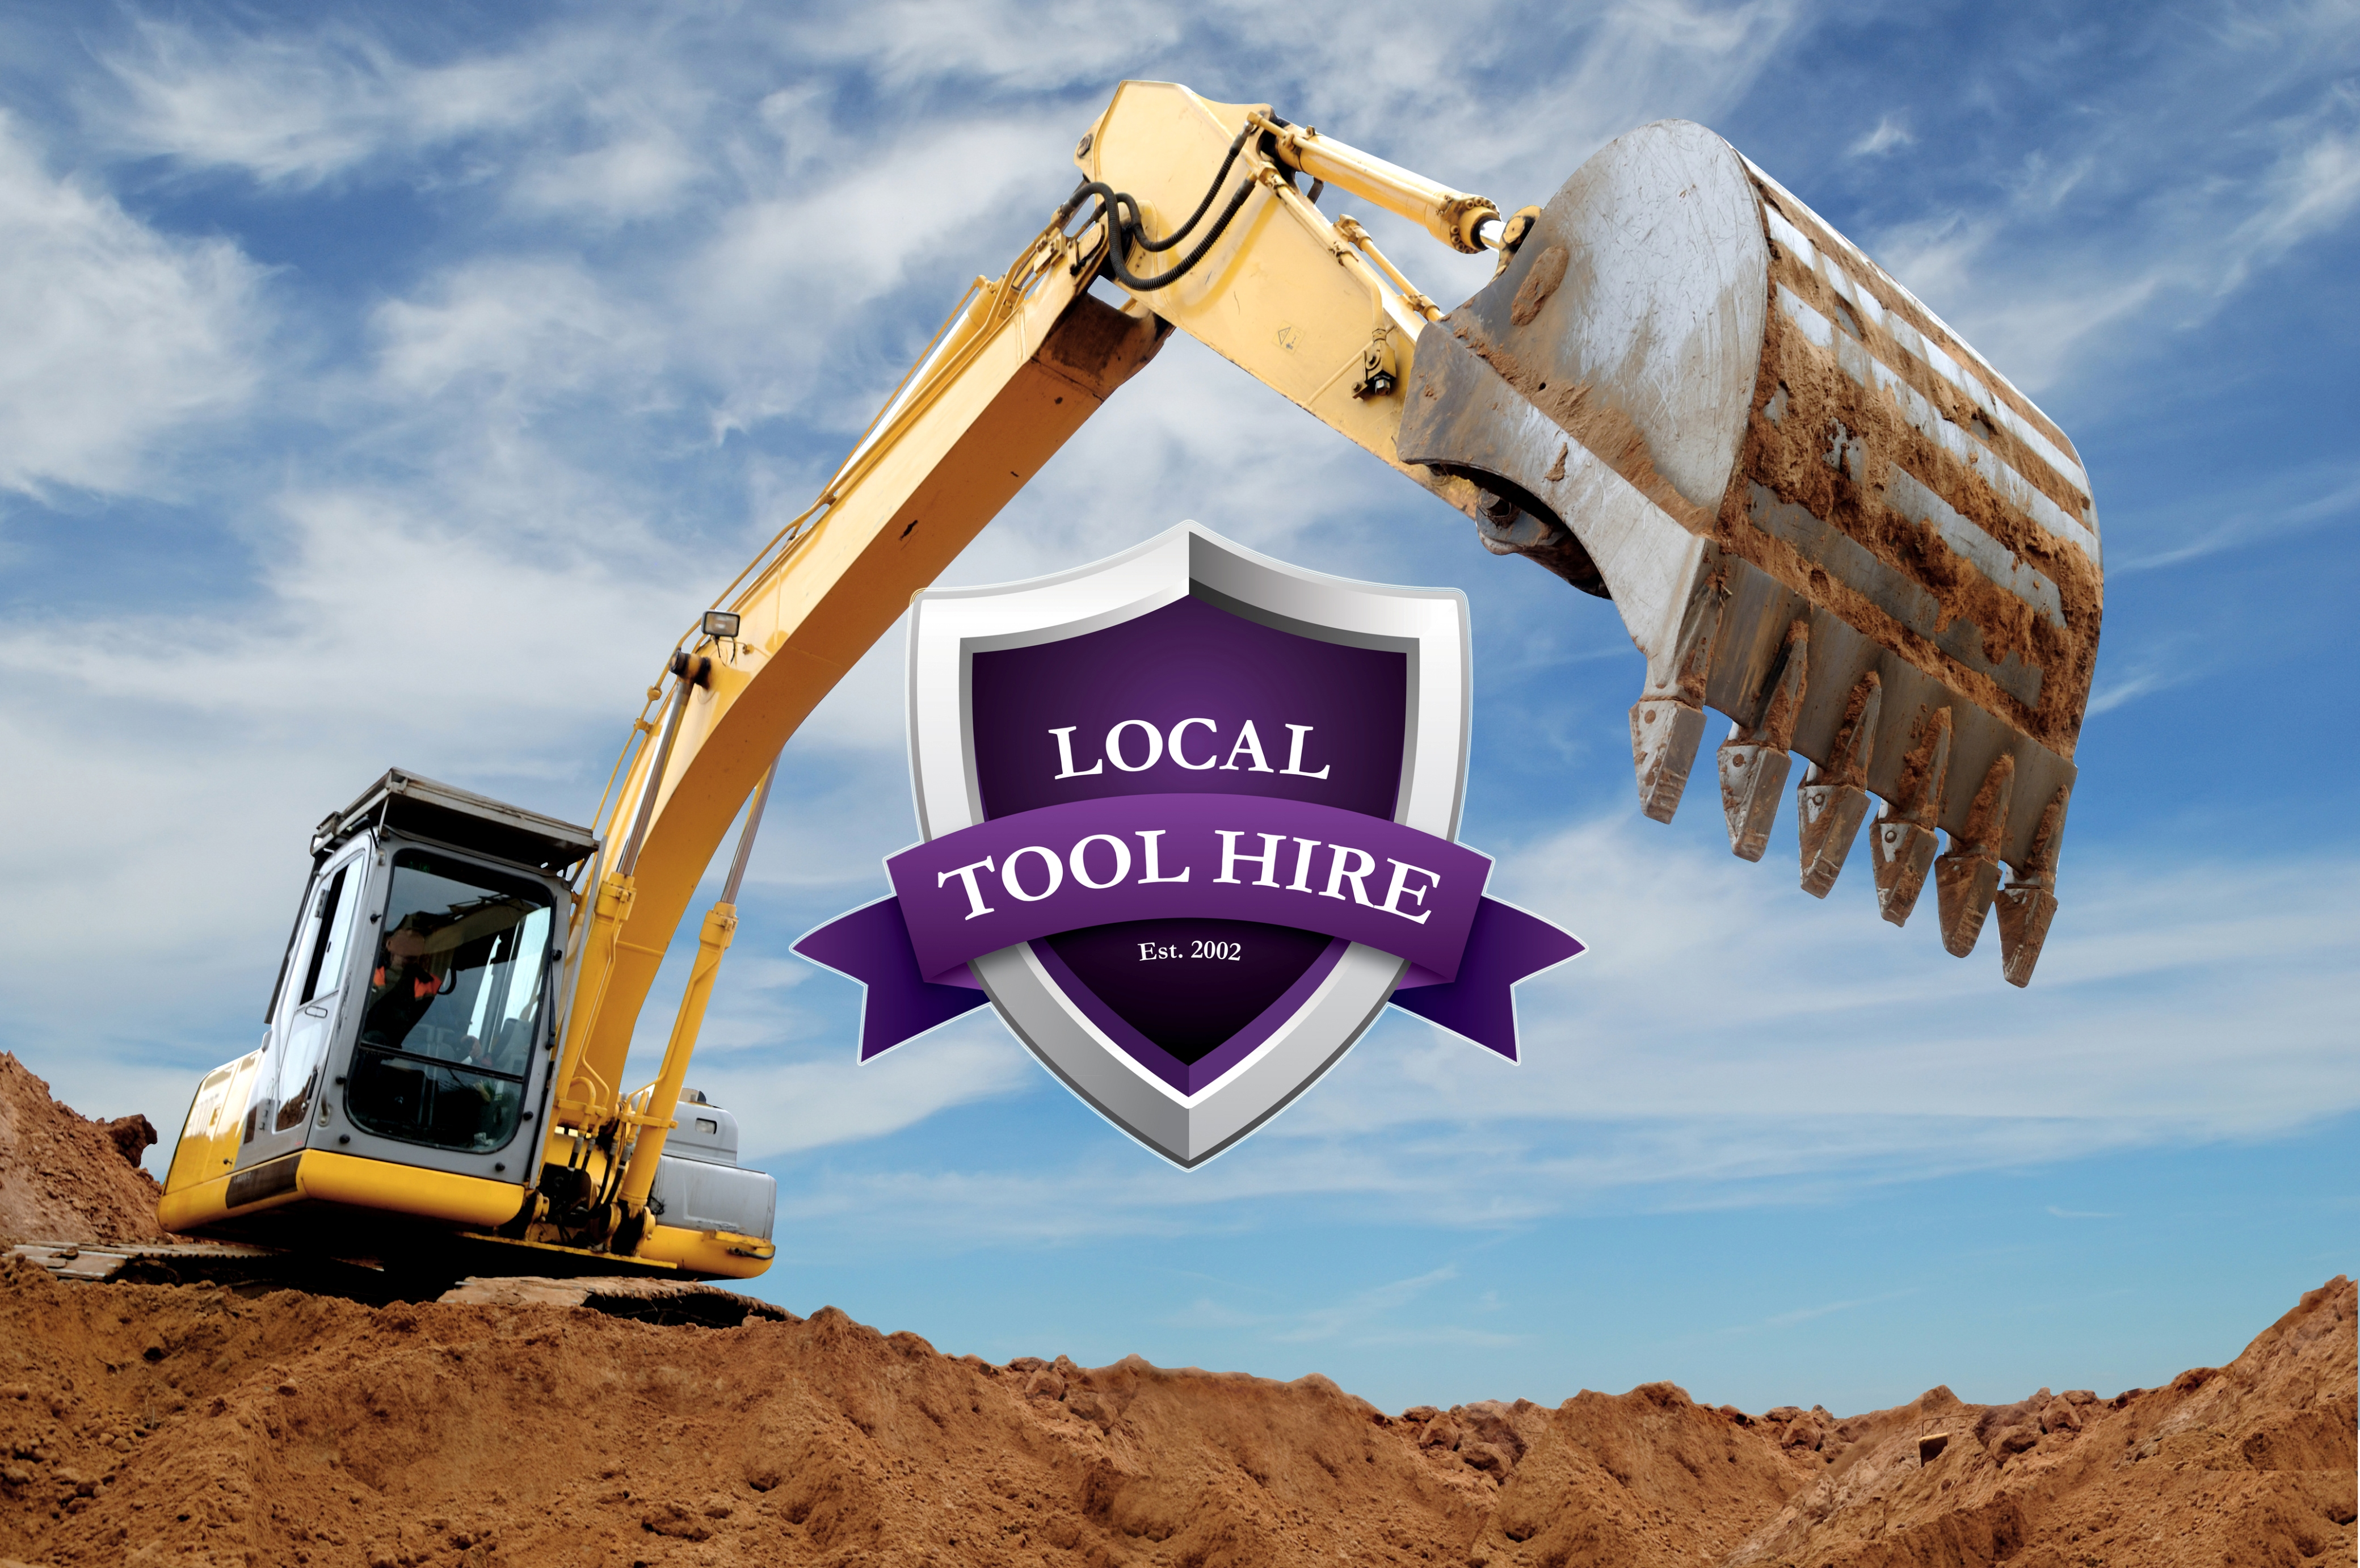 Local Tool Hire ltd